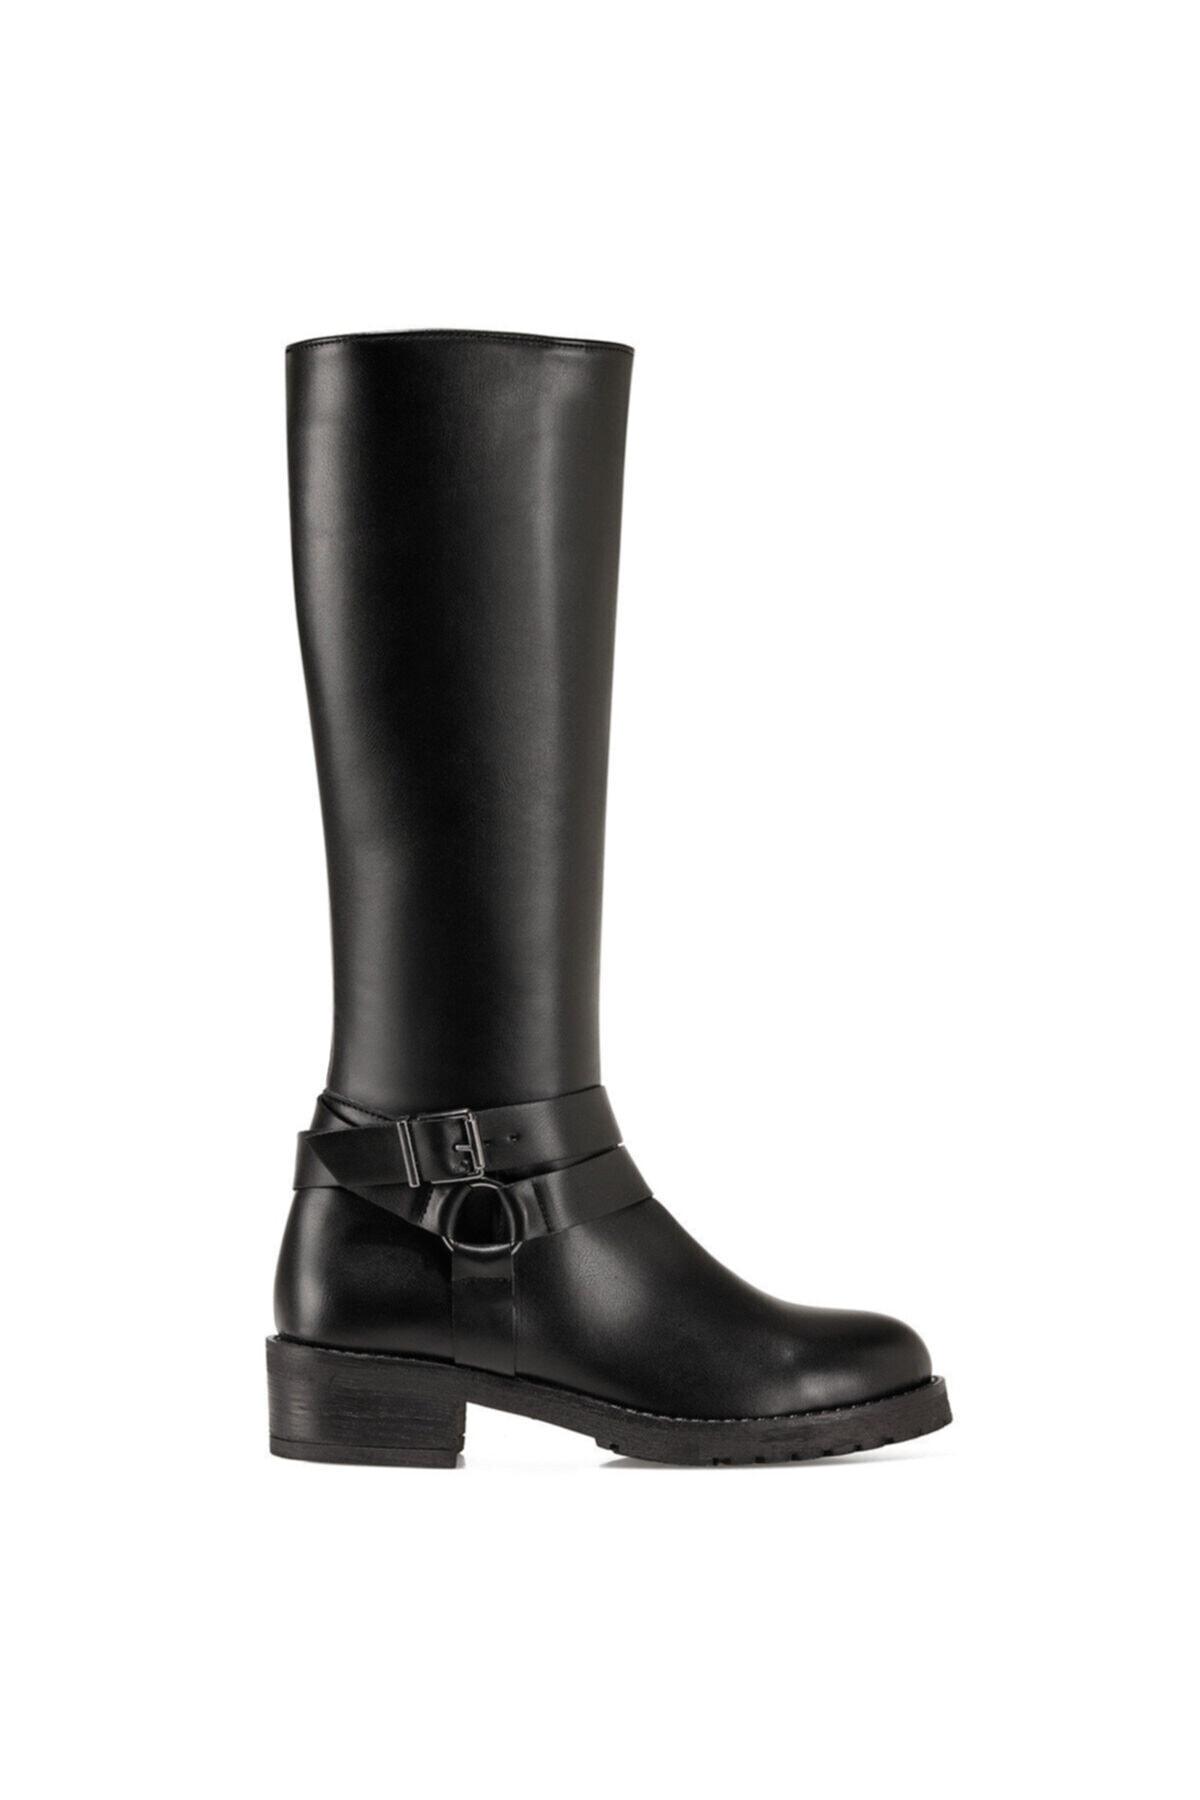 Nine West PASOV Siyah Kadın Çizme 100555960 1